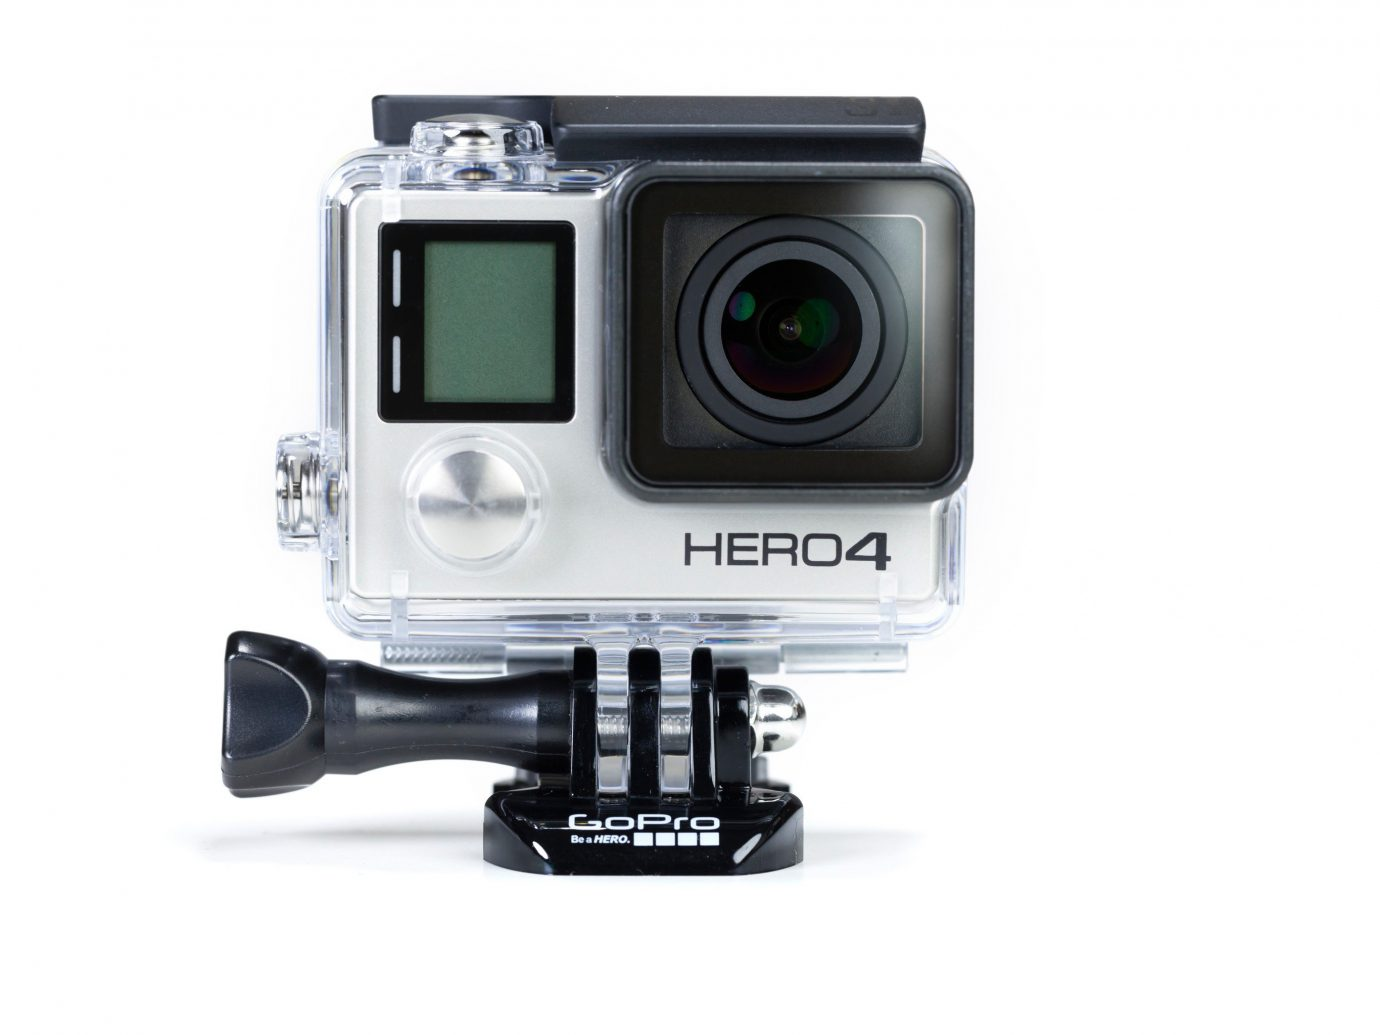 Travel Tips cameras & optics camera electronics digital camera camera lens electronic